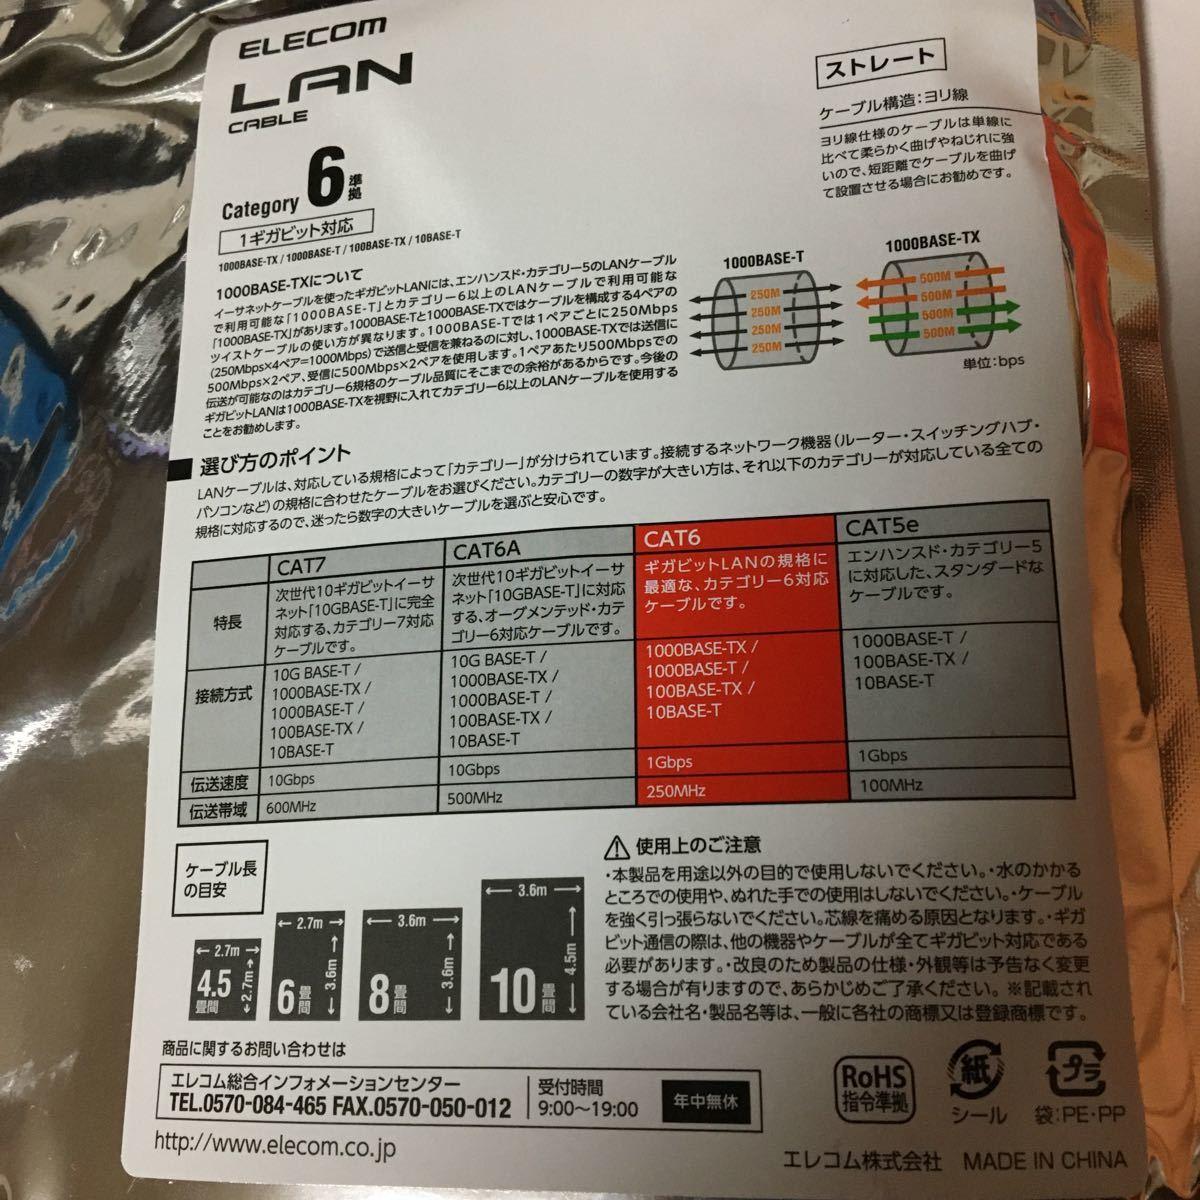 ELECOM LANケーブル CAT6 10m